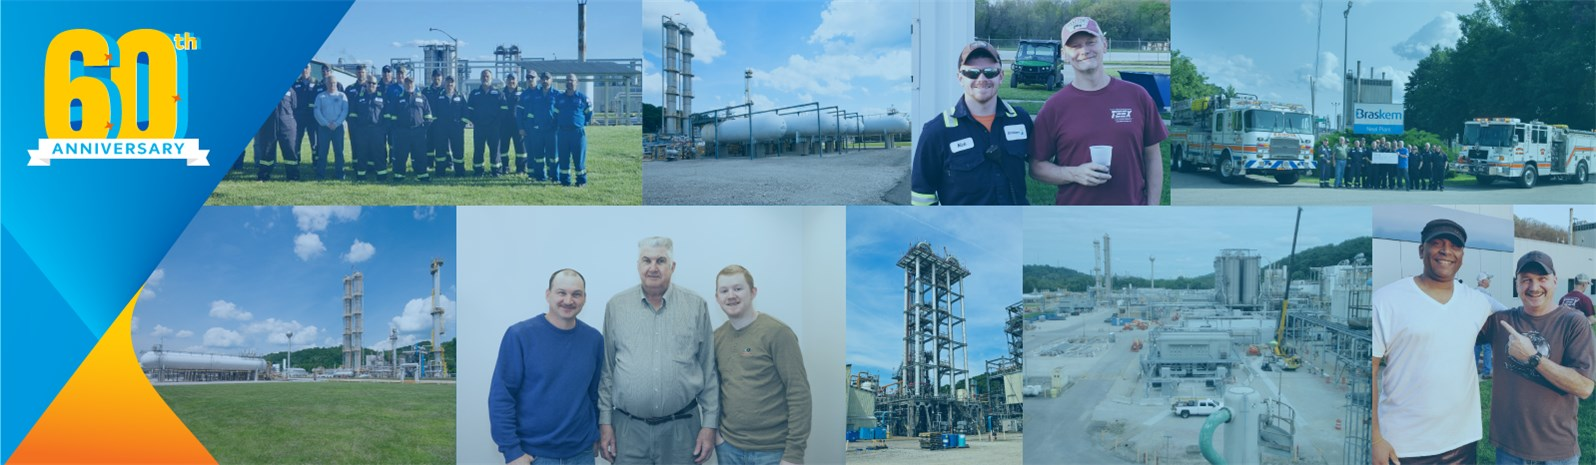 Braskem's Neal plant located in Kenova, West Virginia was originally founded in 1961.